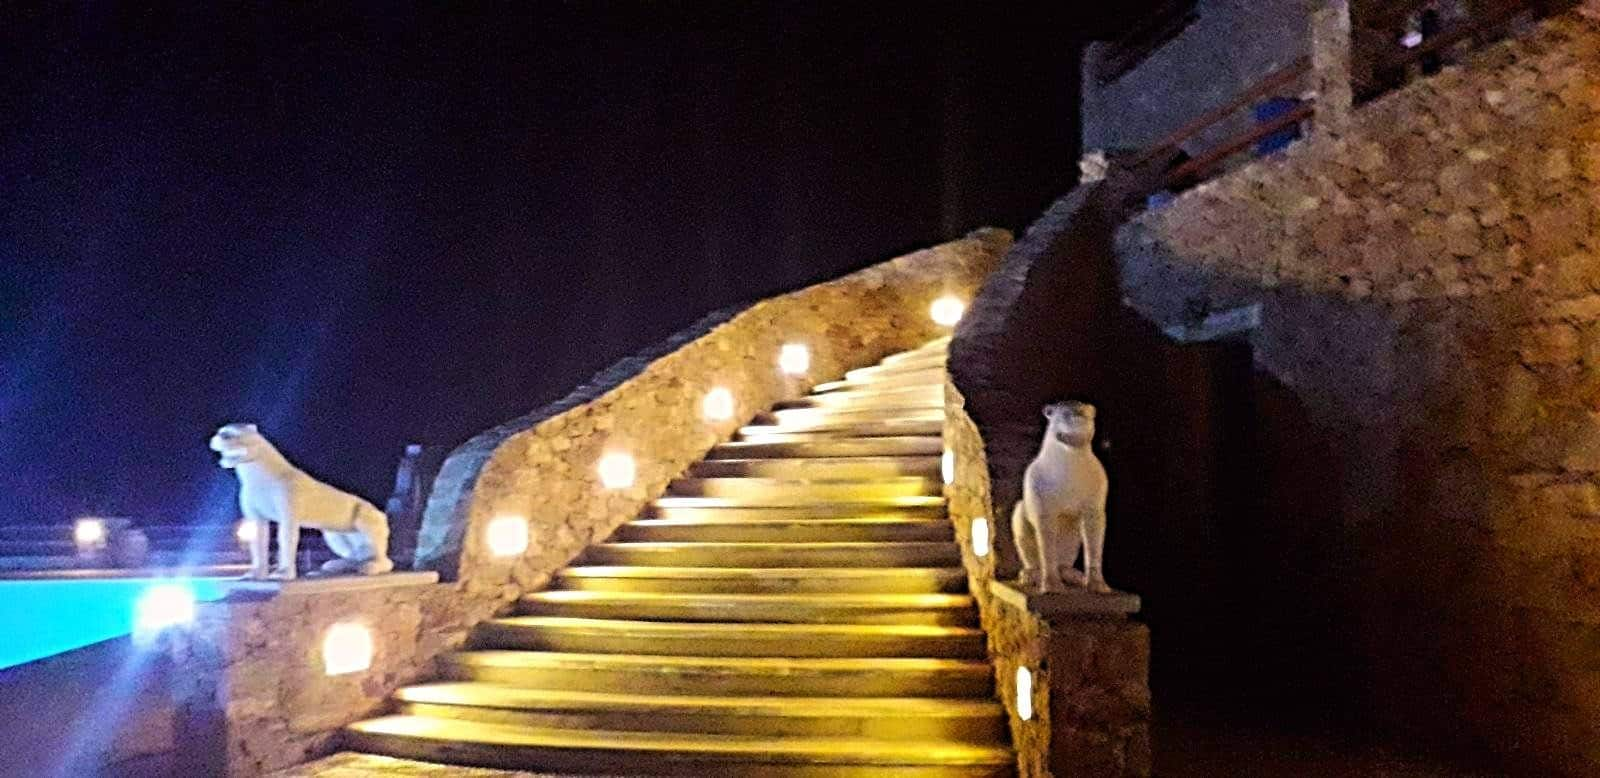 luxurious villa Mykonos - πολυτελής βίλα Μύκονος - mykonos services - οικοδομικές εργασίες 20